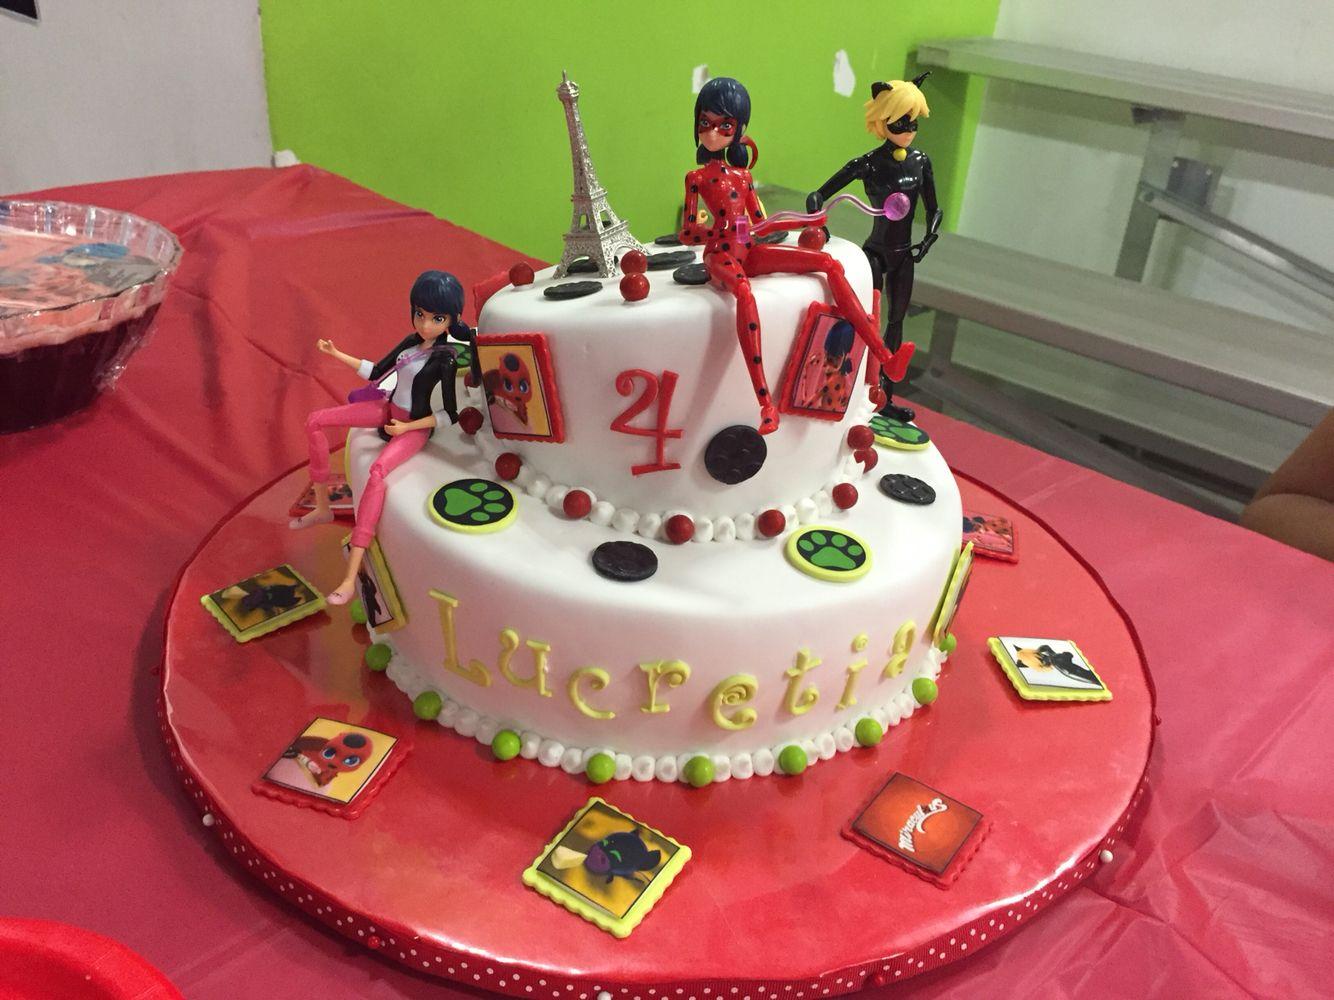 Stupendous Miraculous Ladybug Birthday Cake Lady Bug Birthday Cake Ladybug Funny Birthday Cards Online Fluifree Goldxyz